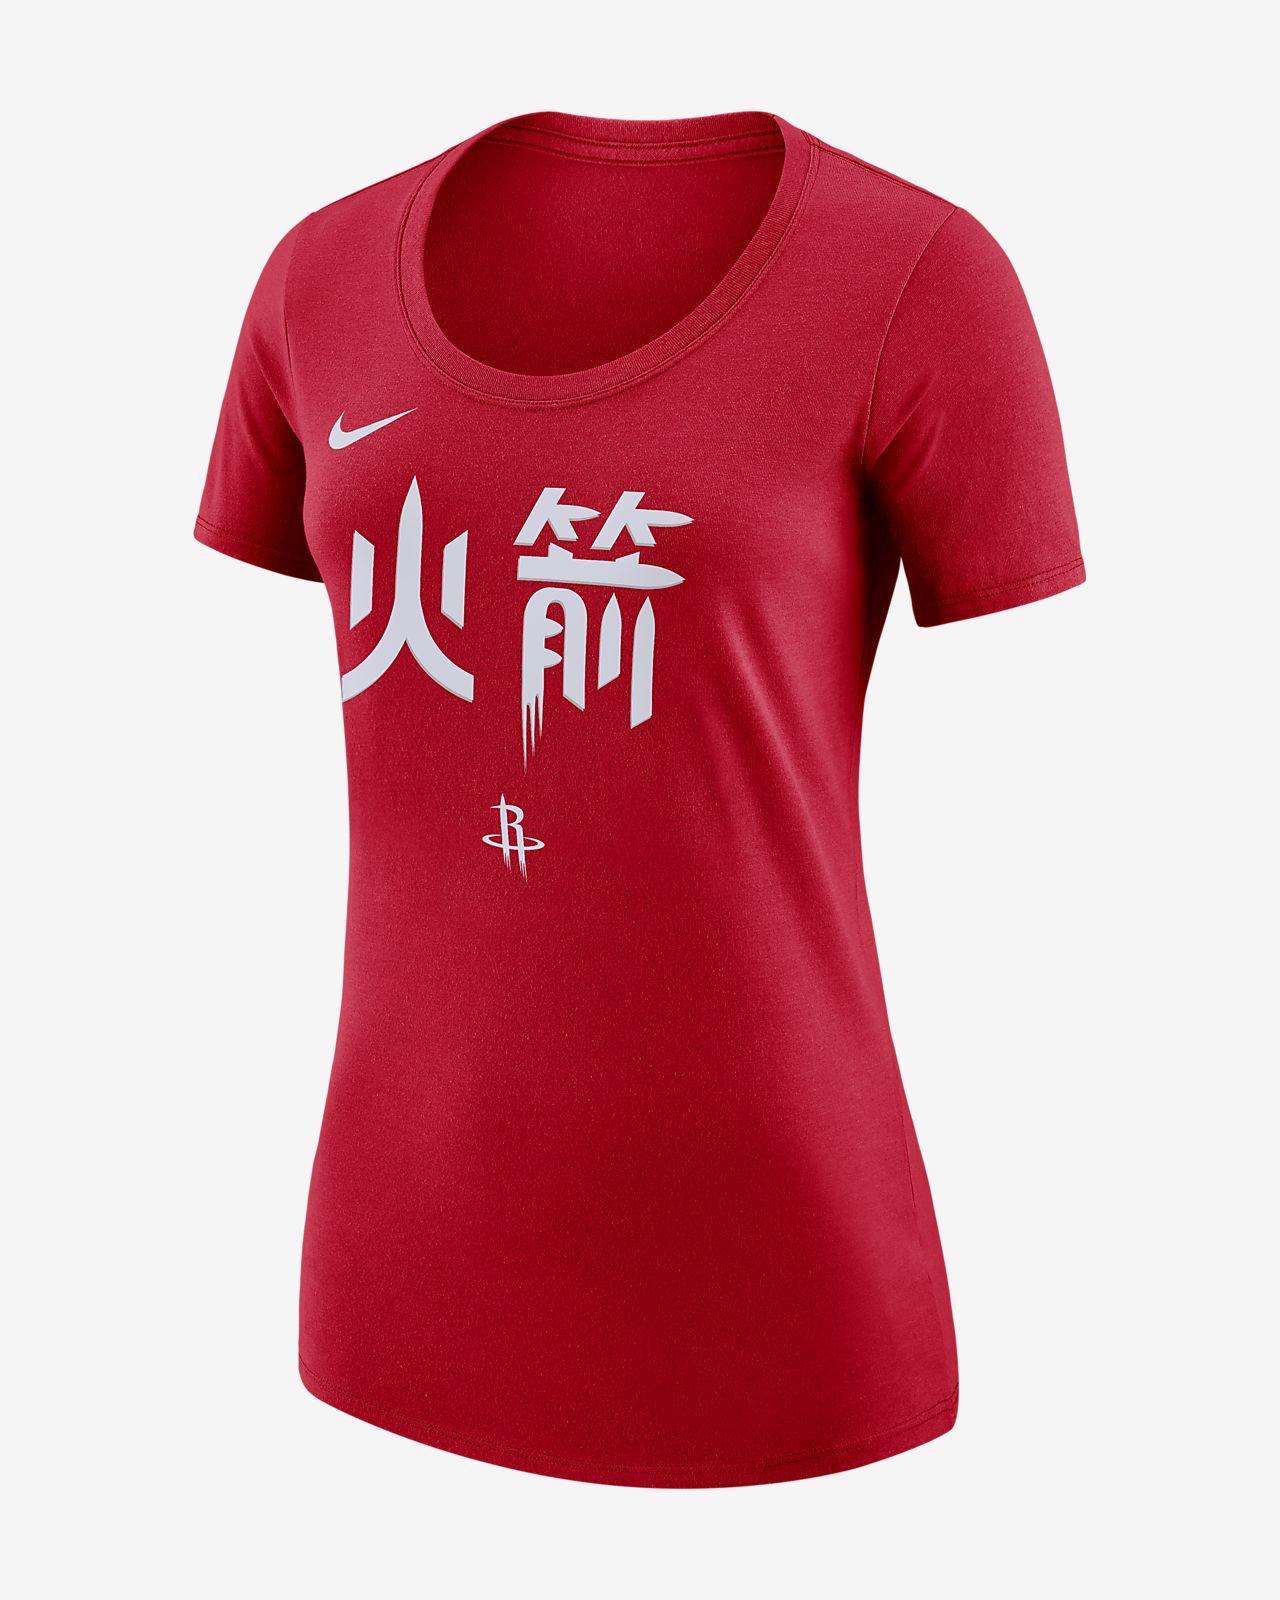 ... Houston Rockets City Edition Nike Dri-FIT Women's NBA T-Shirt